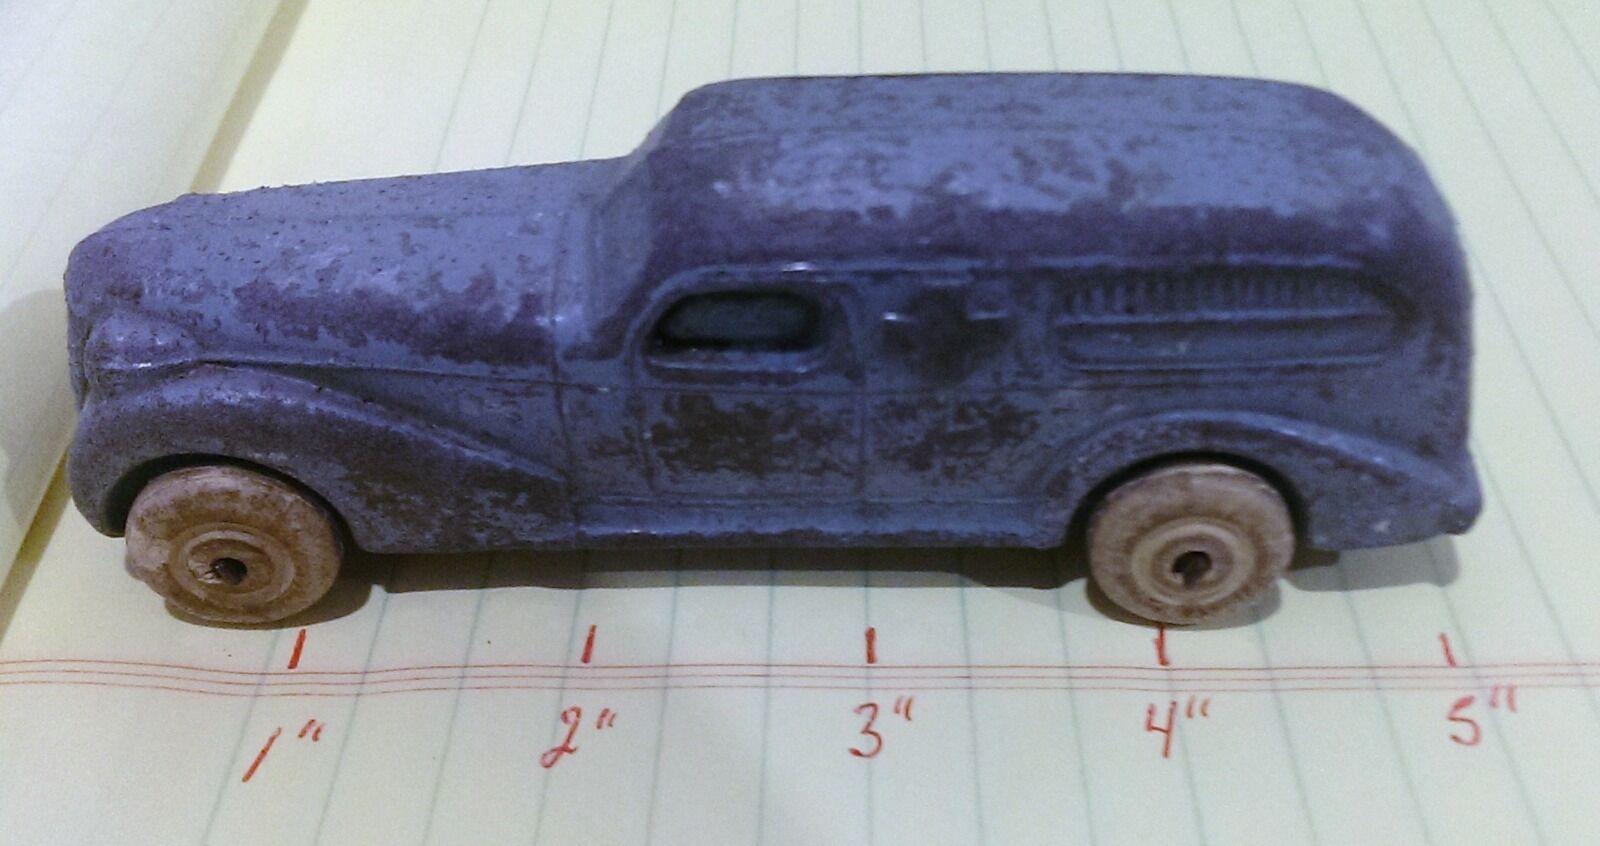 VINTAGE 1940's DIECAST SLUSH METAL ART DECO AMBULANCE CAR BARCLAY